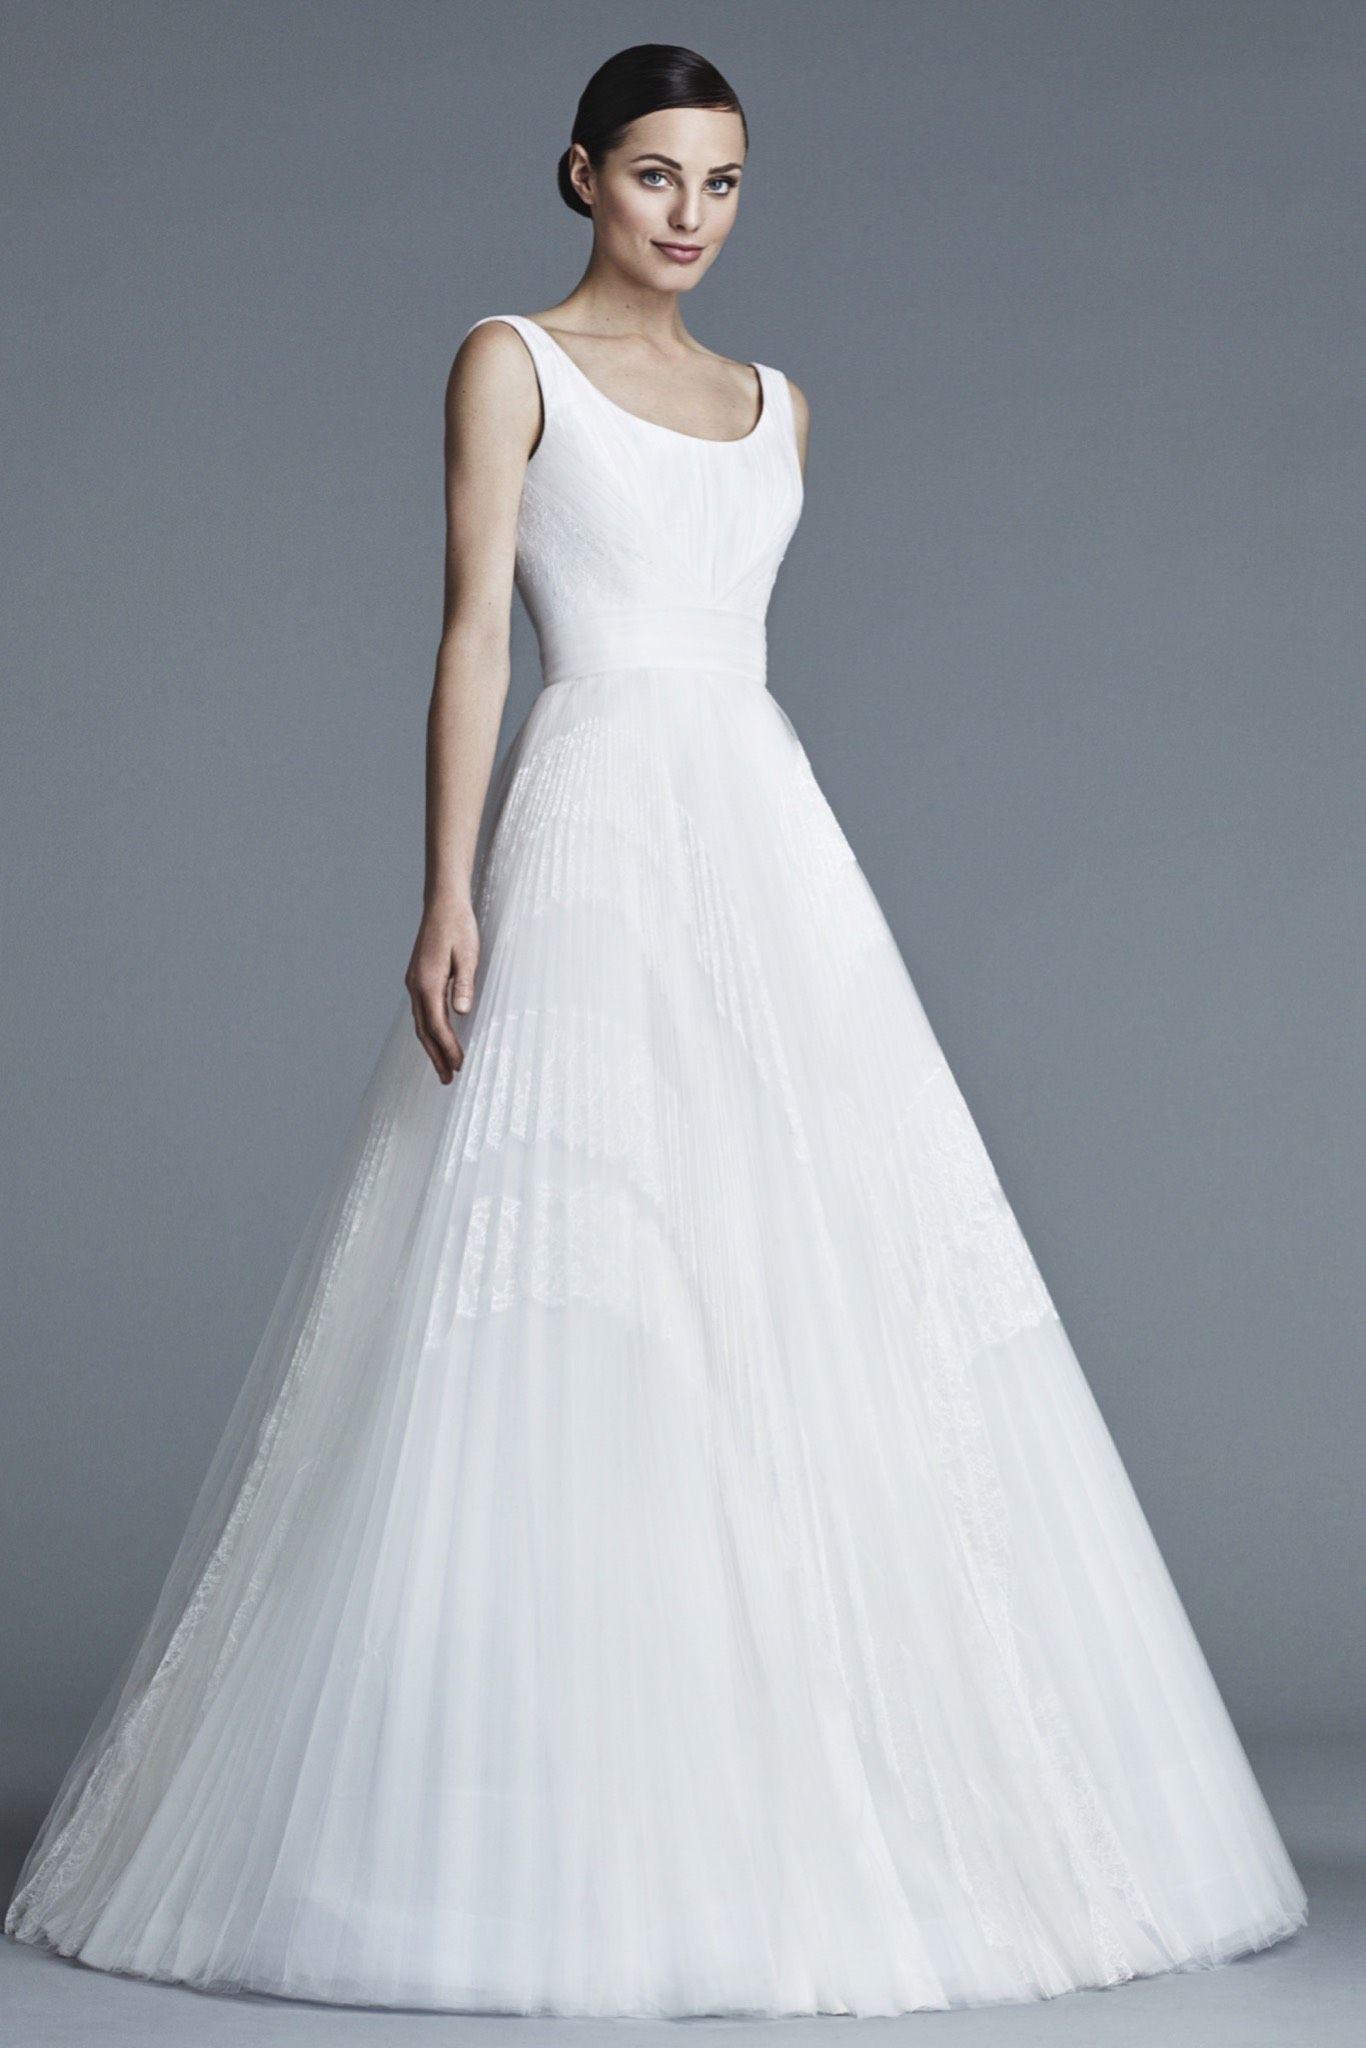 J Mendel Bridal Spring 16 2016 Wedding Dresses Modern Wedding Dress Bridal Gowns